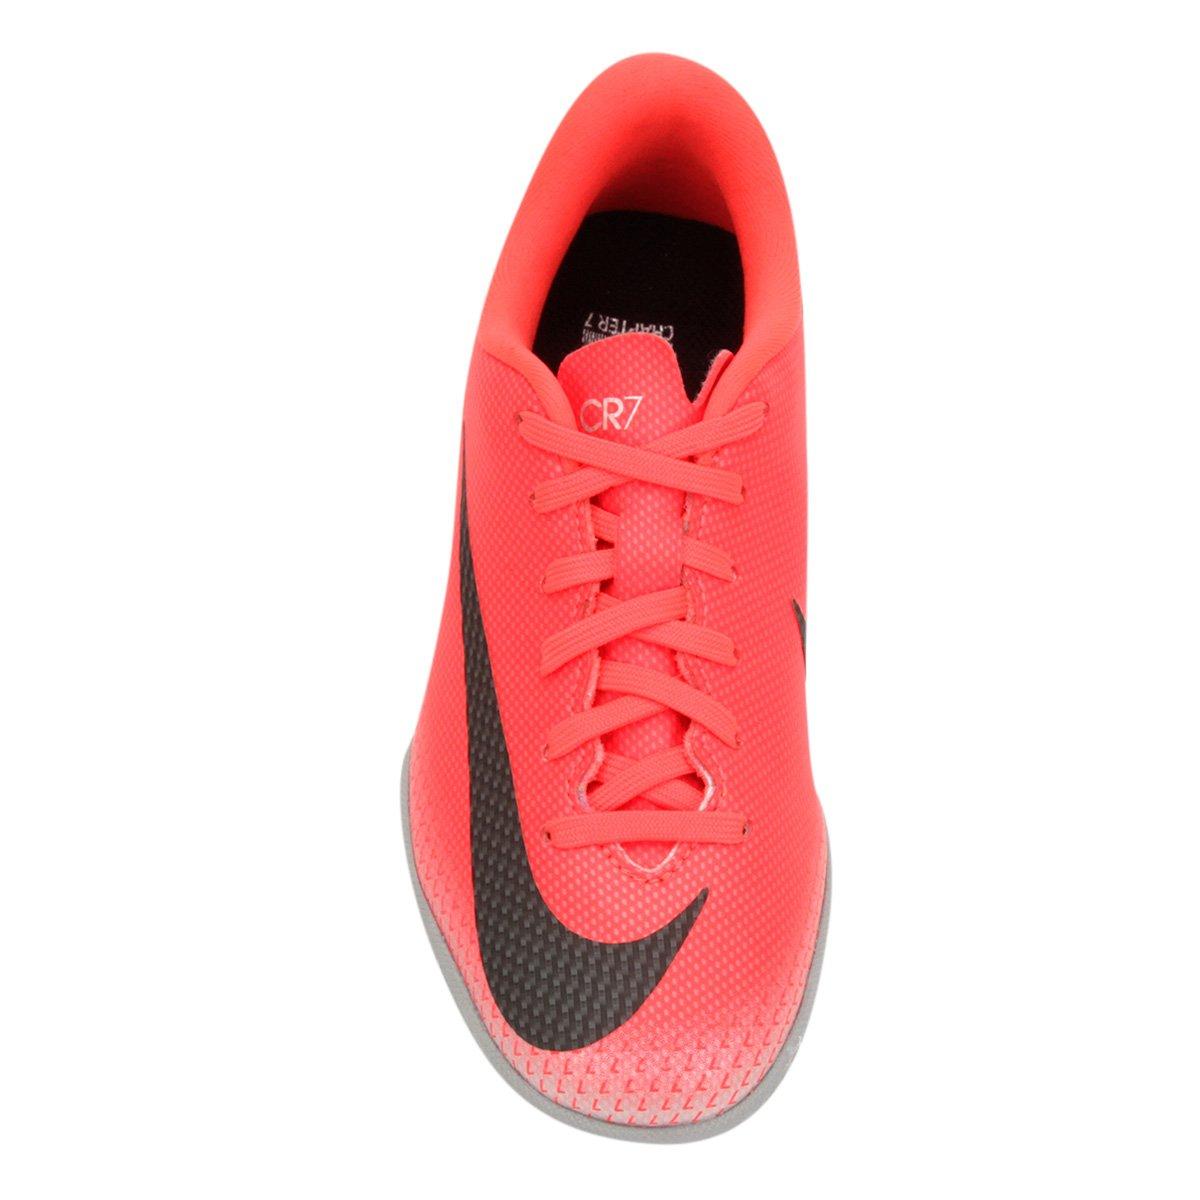 027f9ccf6f125 ... Chuteira Futsal Infantil Nike Mercurial Vapor 12 Academy GS CR7 IC - 2  ...